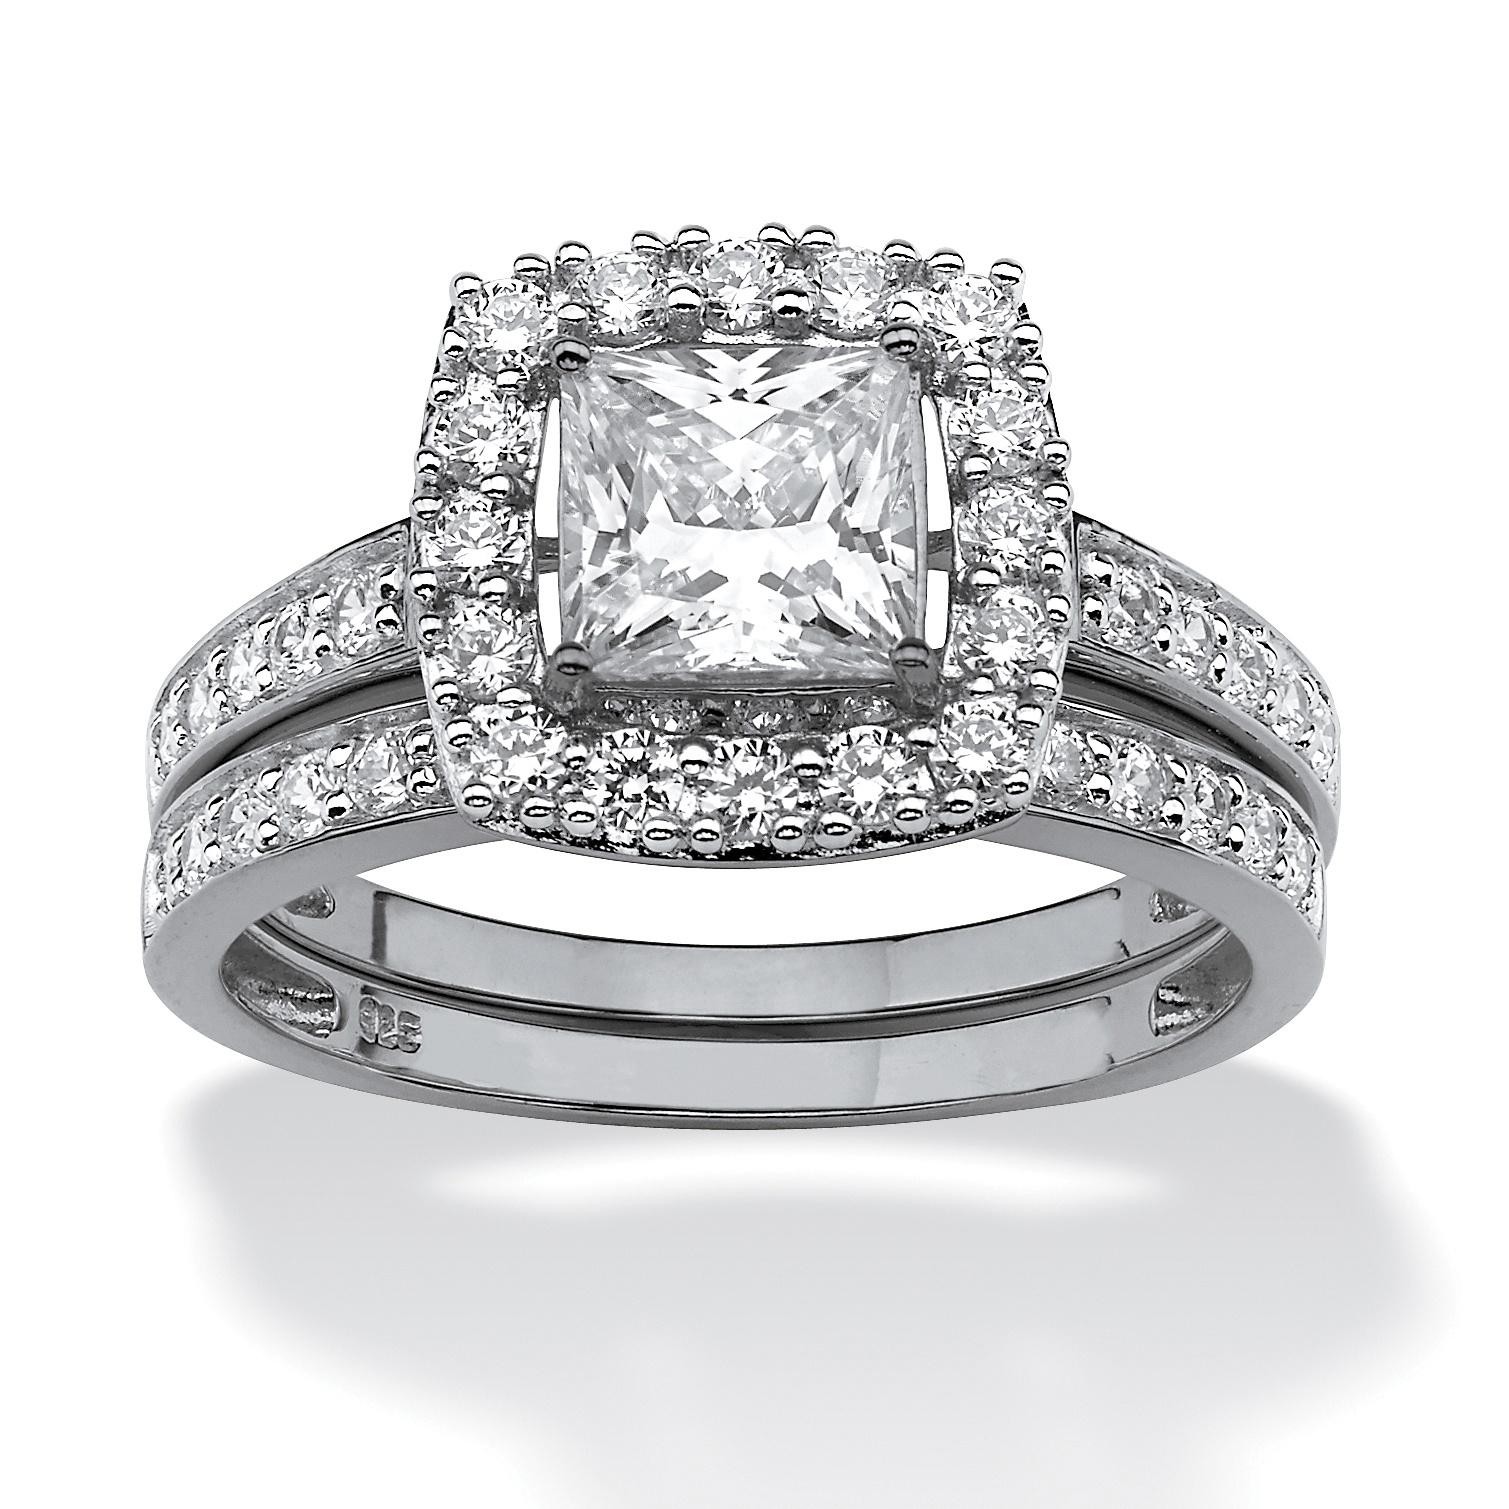 palm beach wedding ring sets walmart jewelry wedding sets Palm beach wedding ring sets